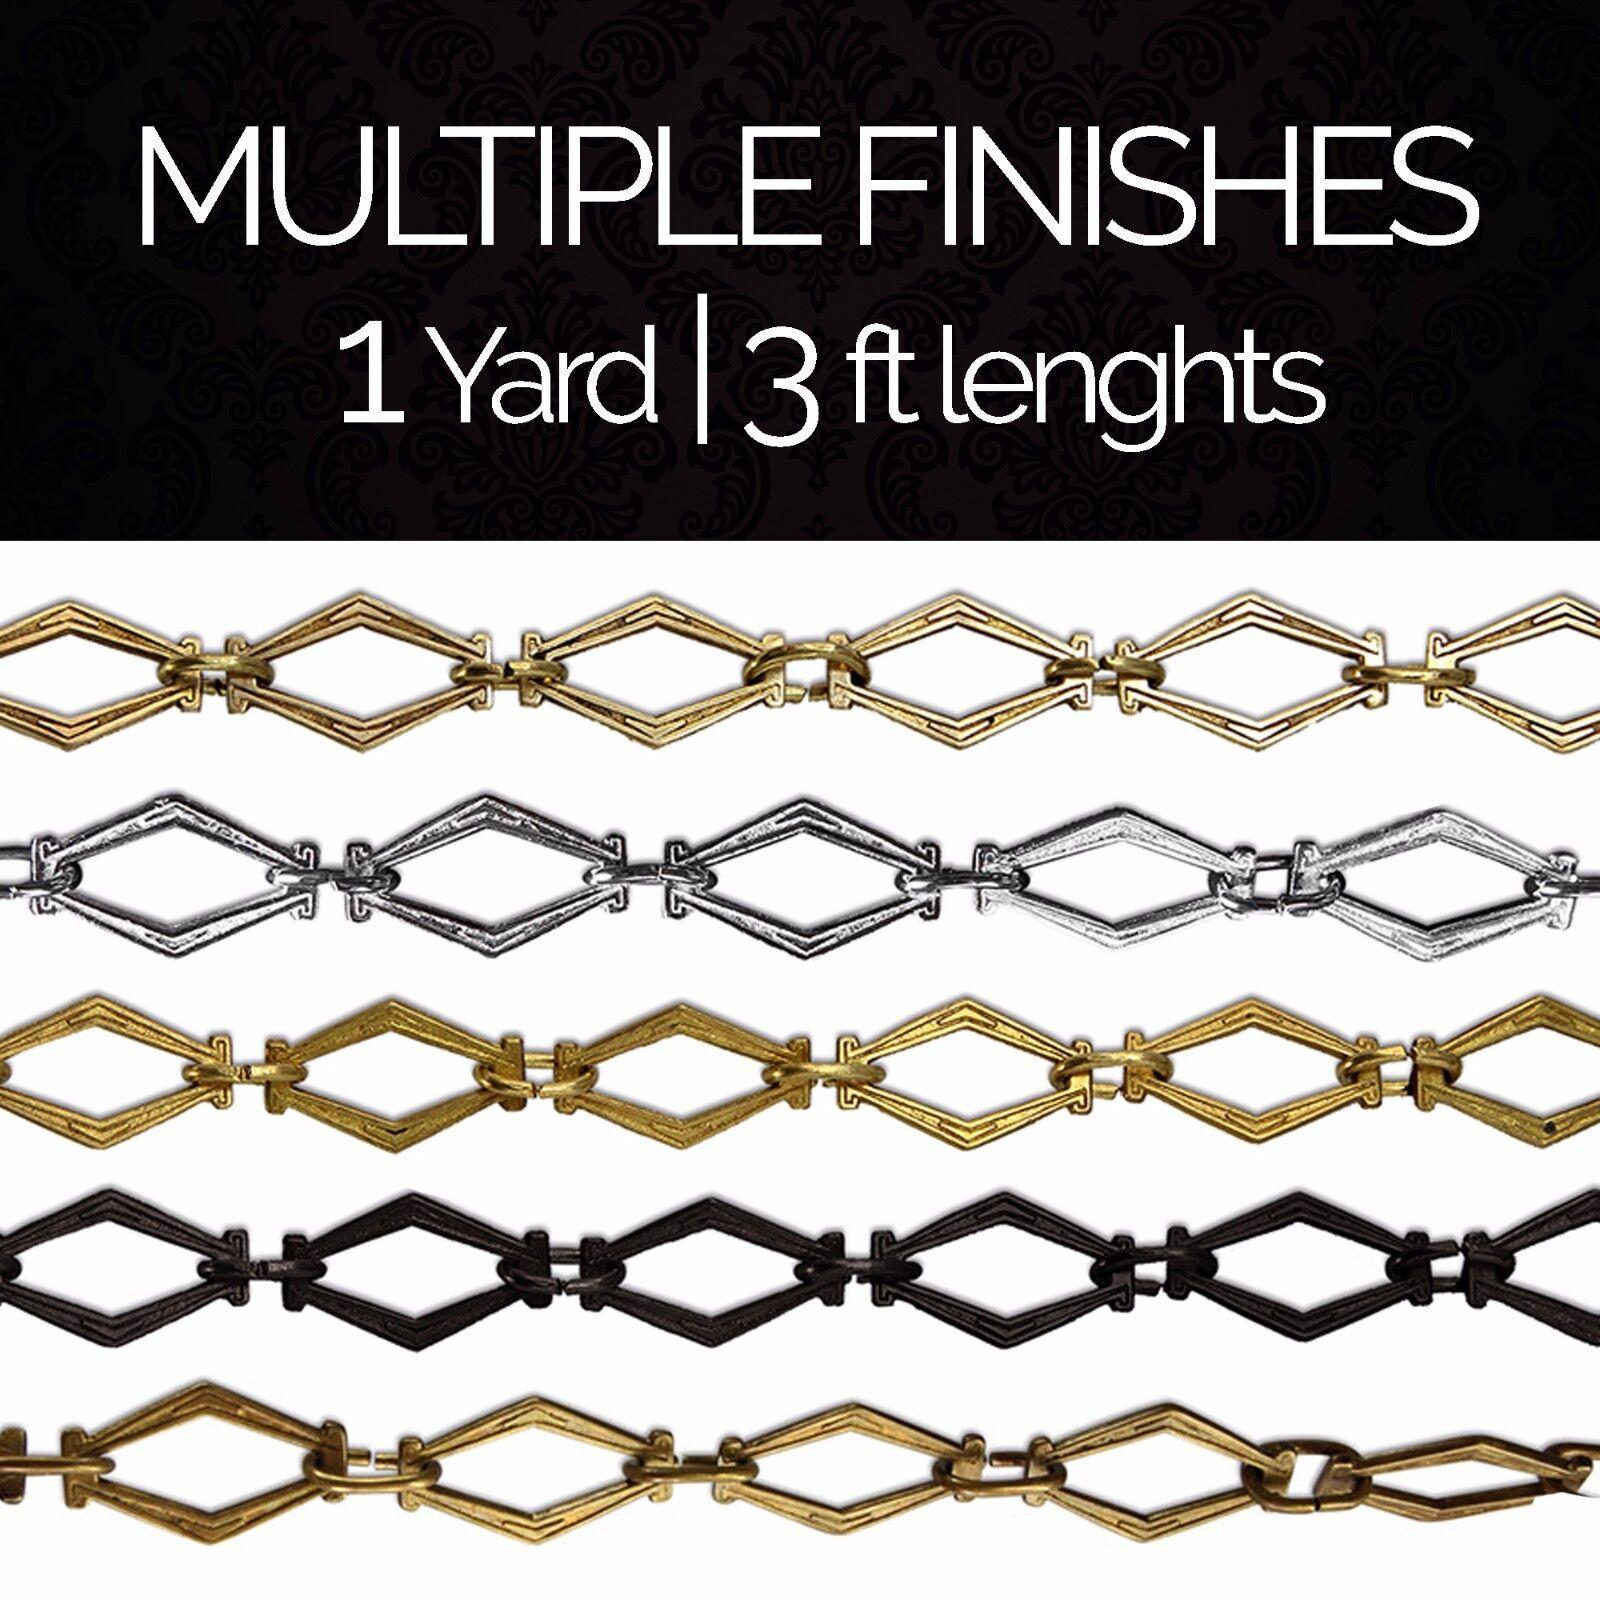 Solid Brass Hexagonal Chandelier Pendant Lighting Chain #22